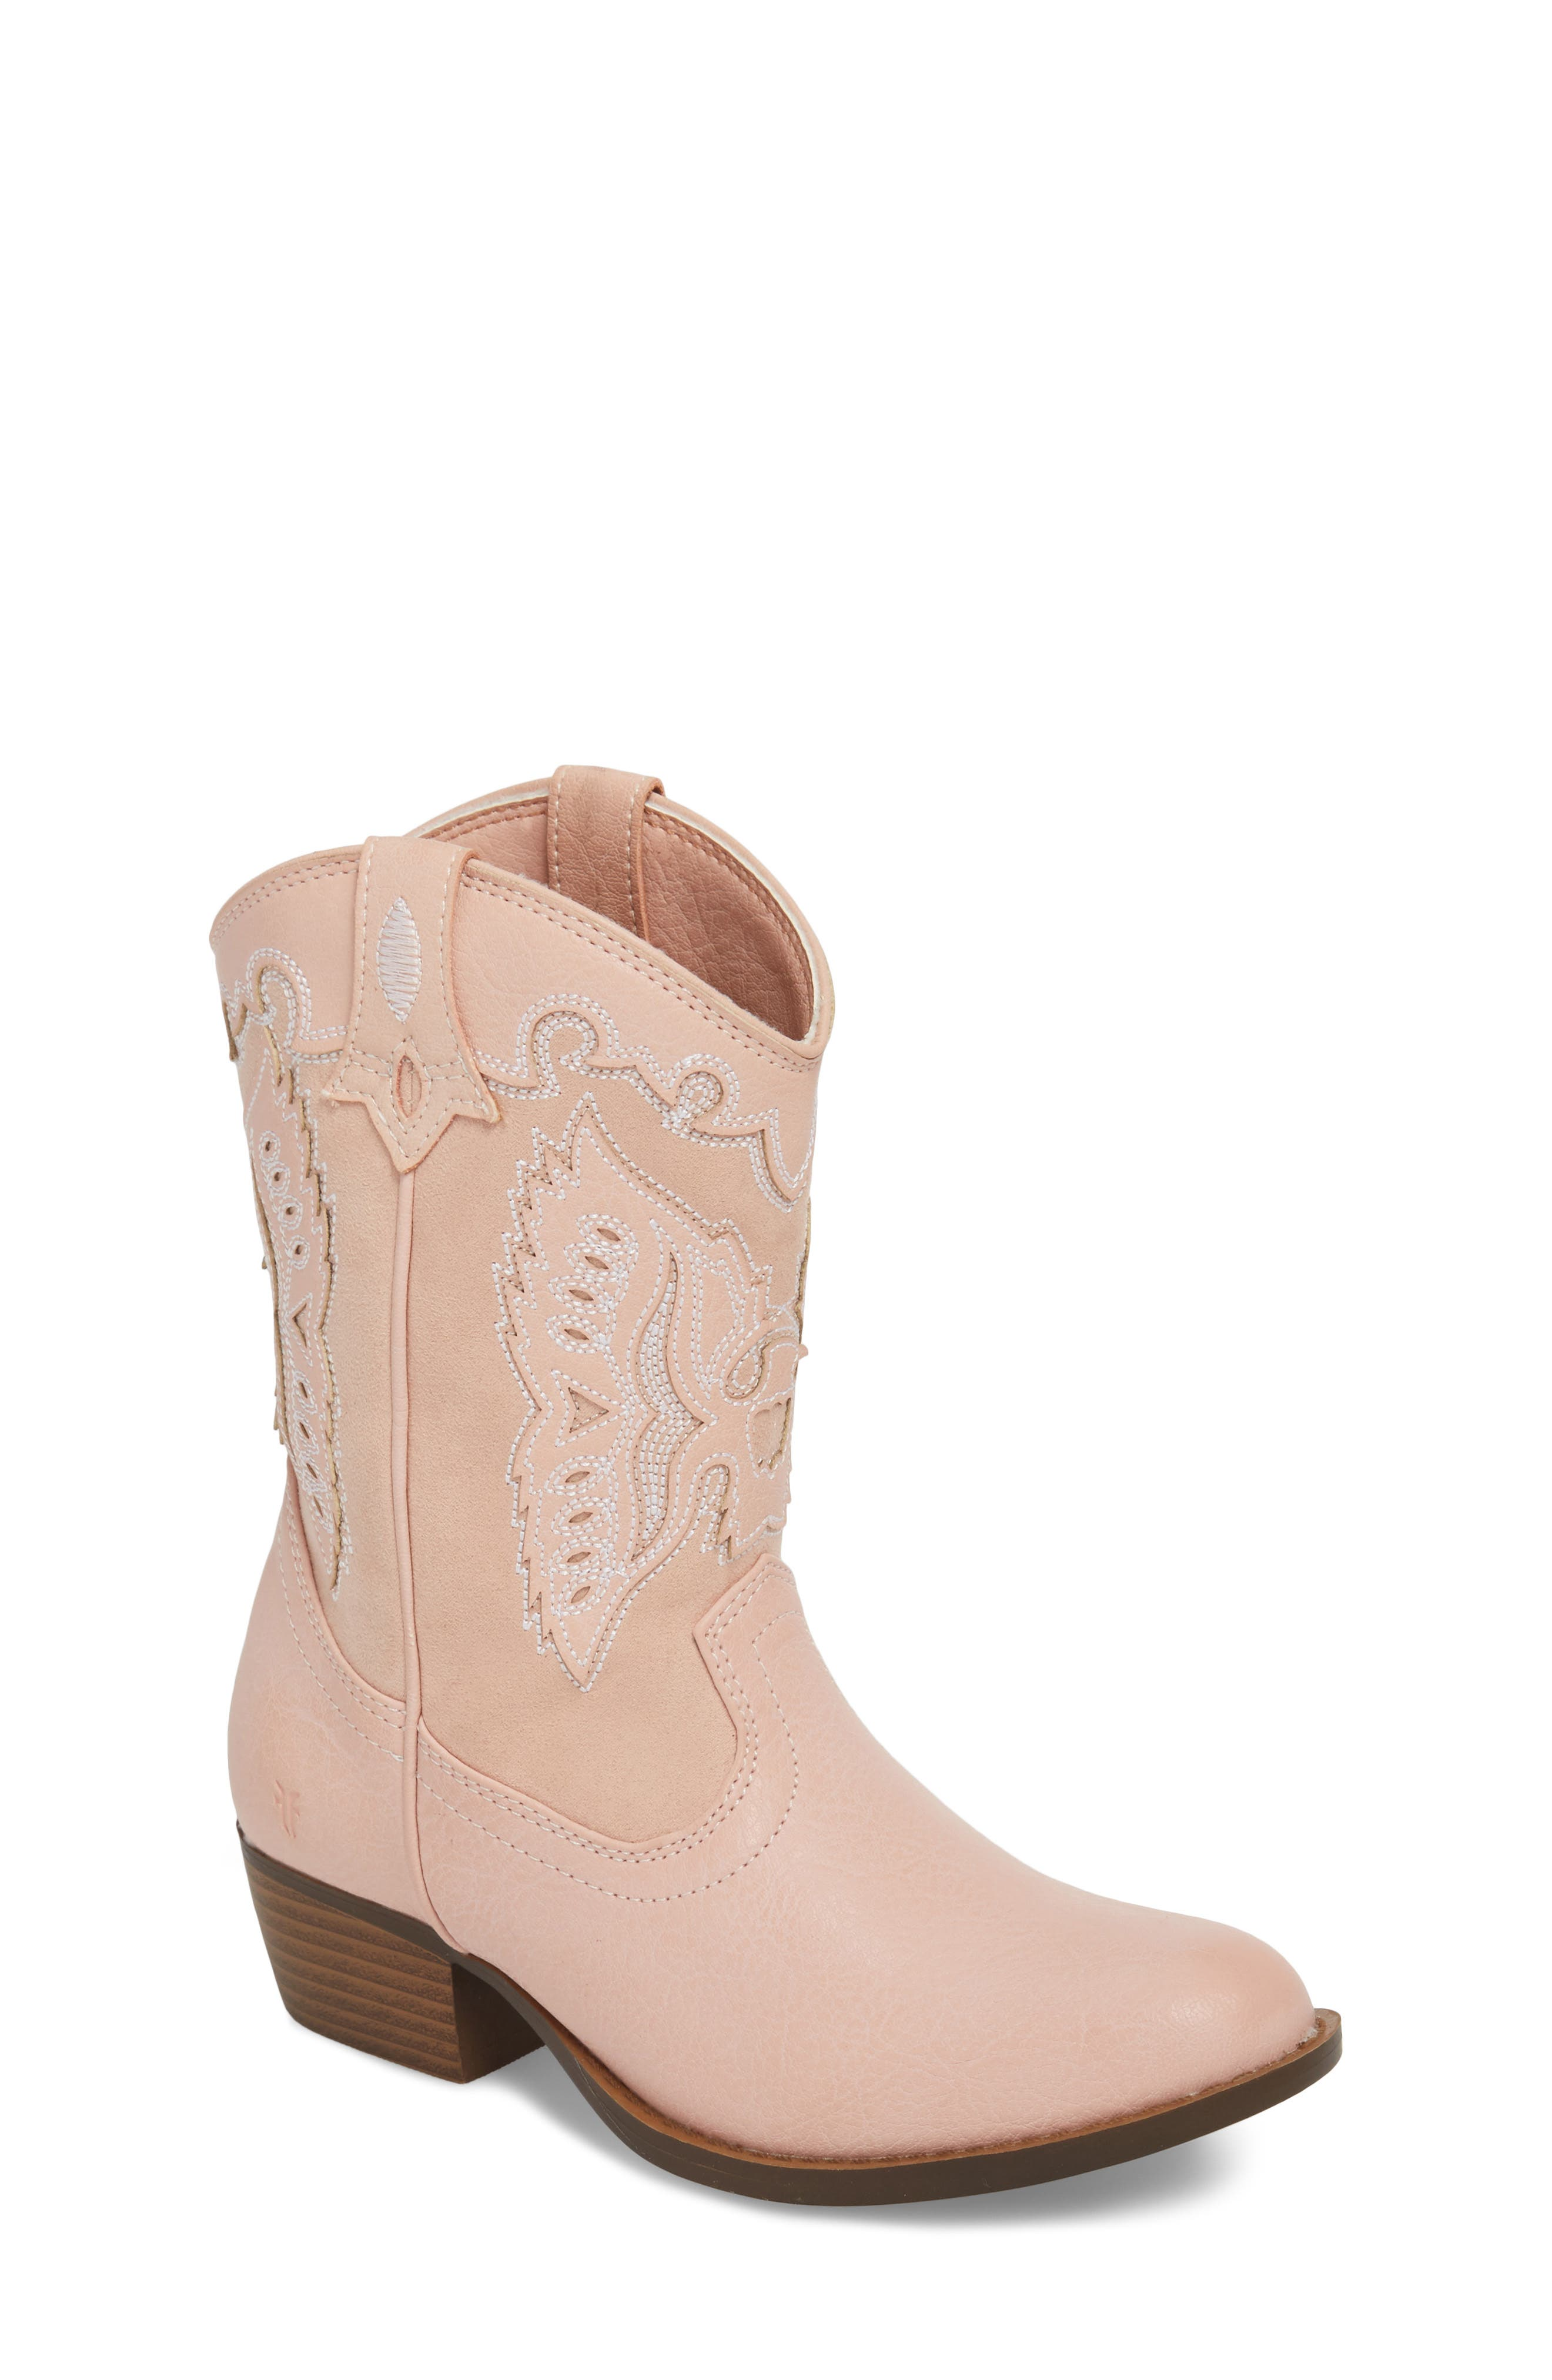 FRYE, Carson Firebird Cowgirl Boot, Main thumbnail 1, color, PINK